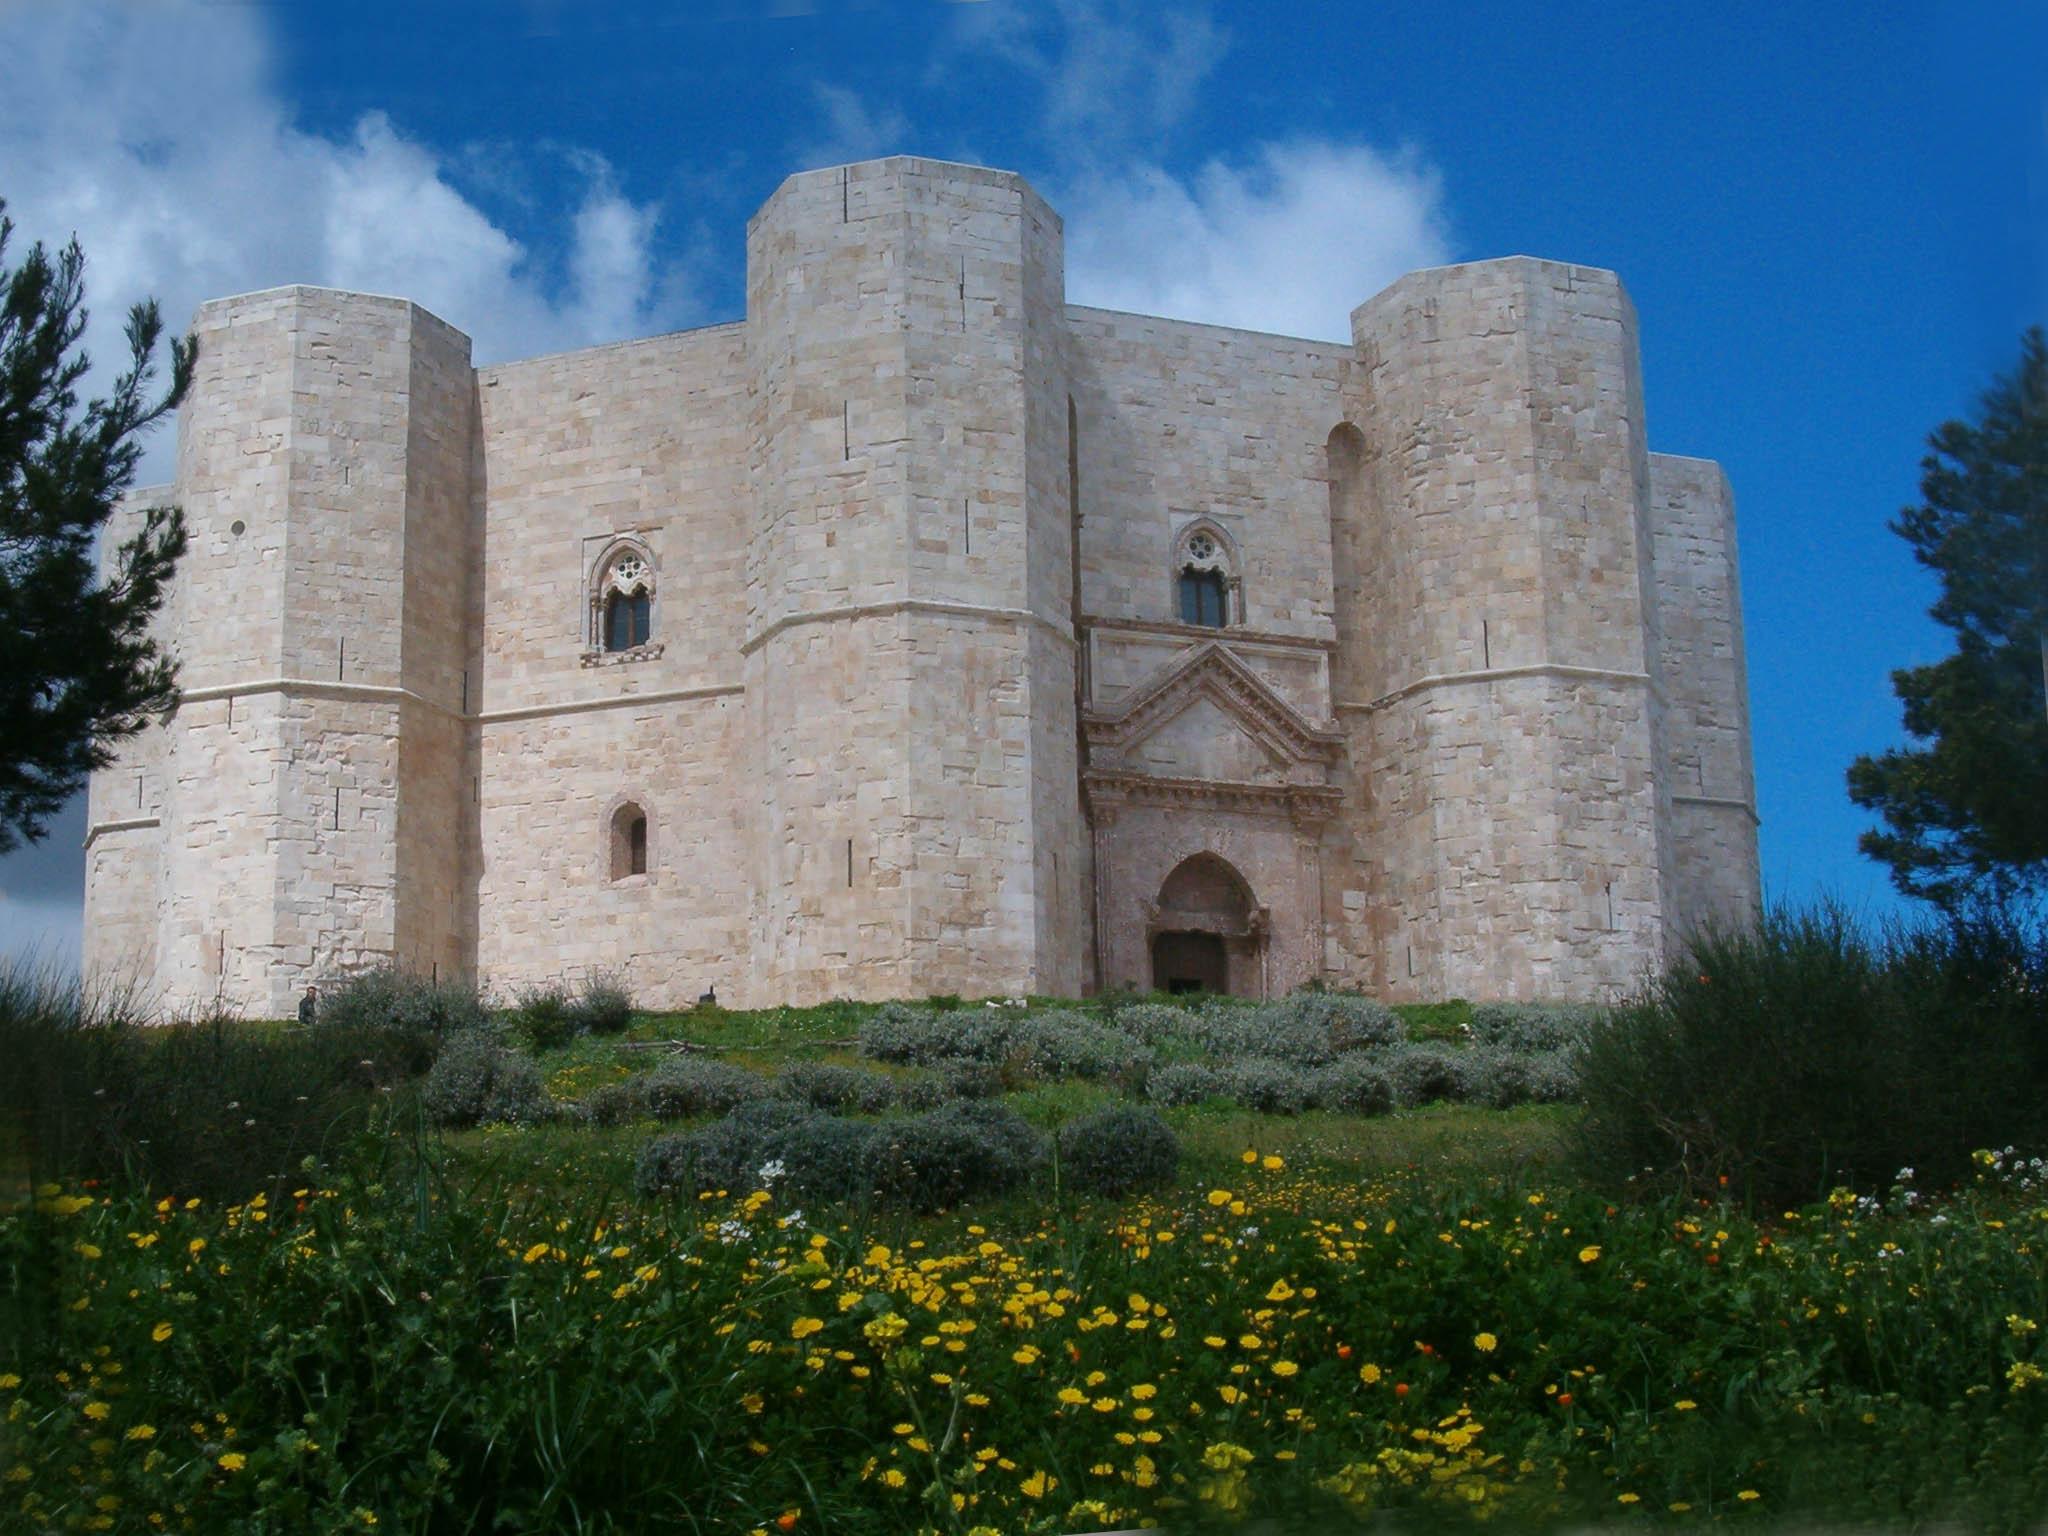 Castel_del_Monte_giu06_001